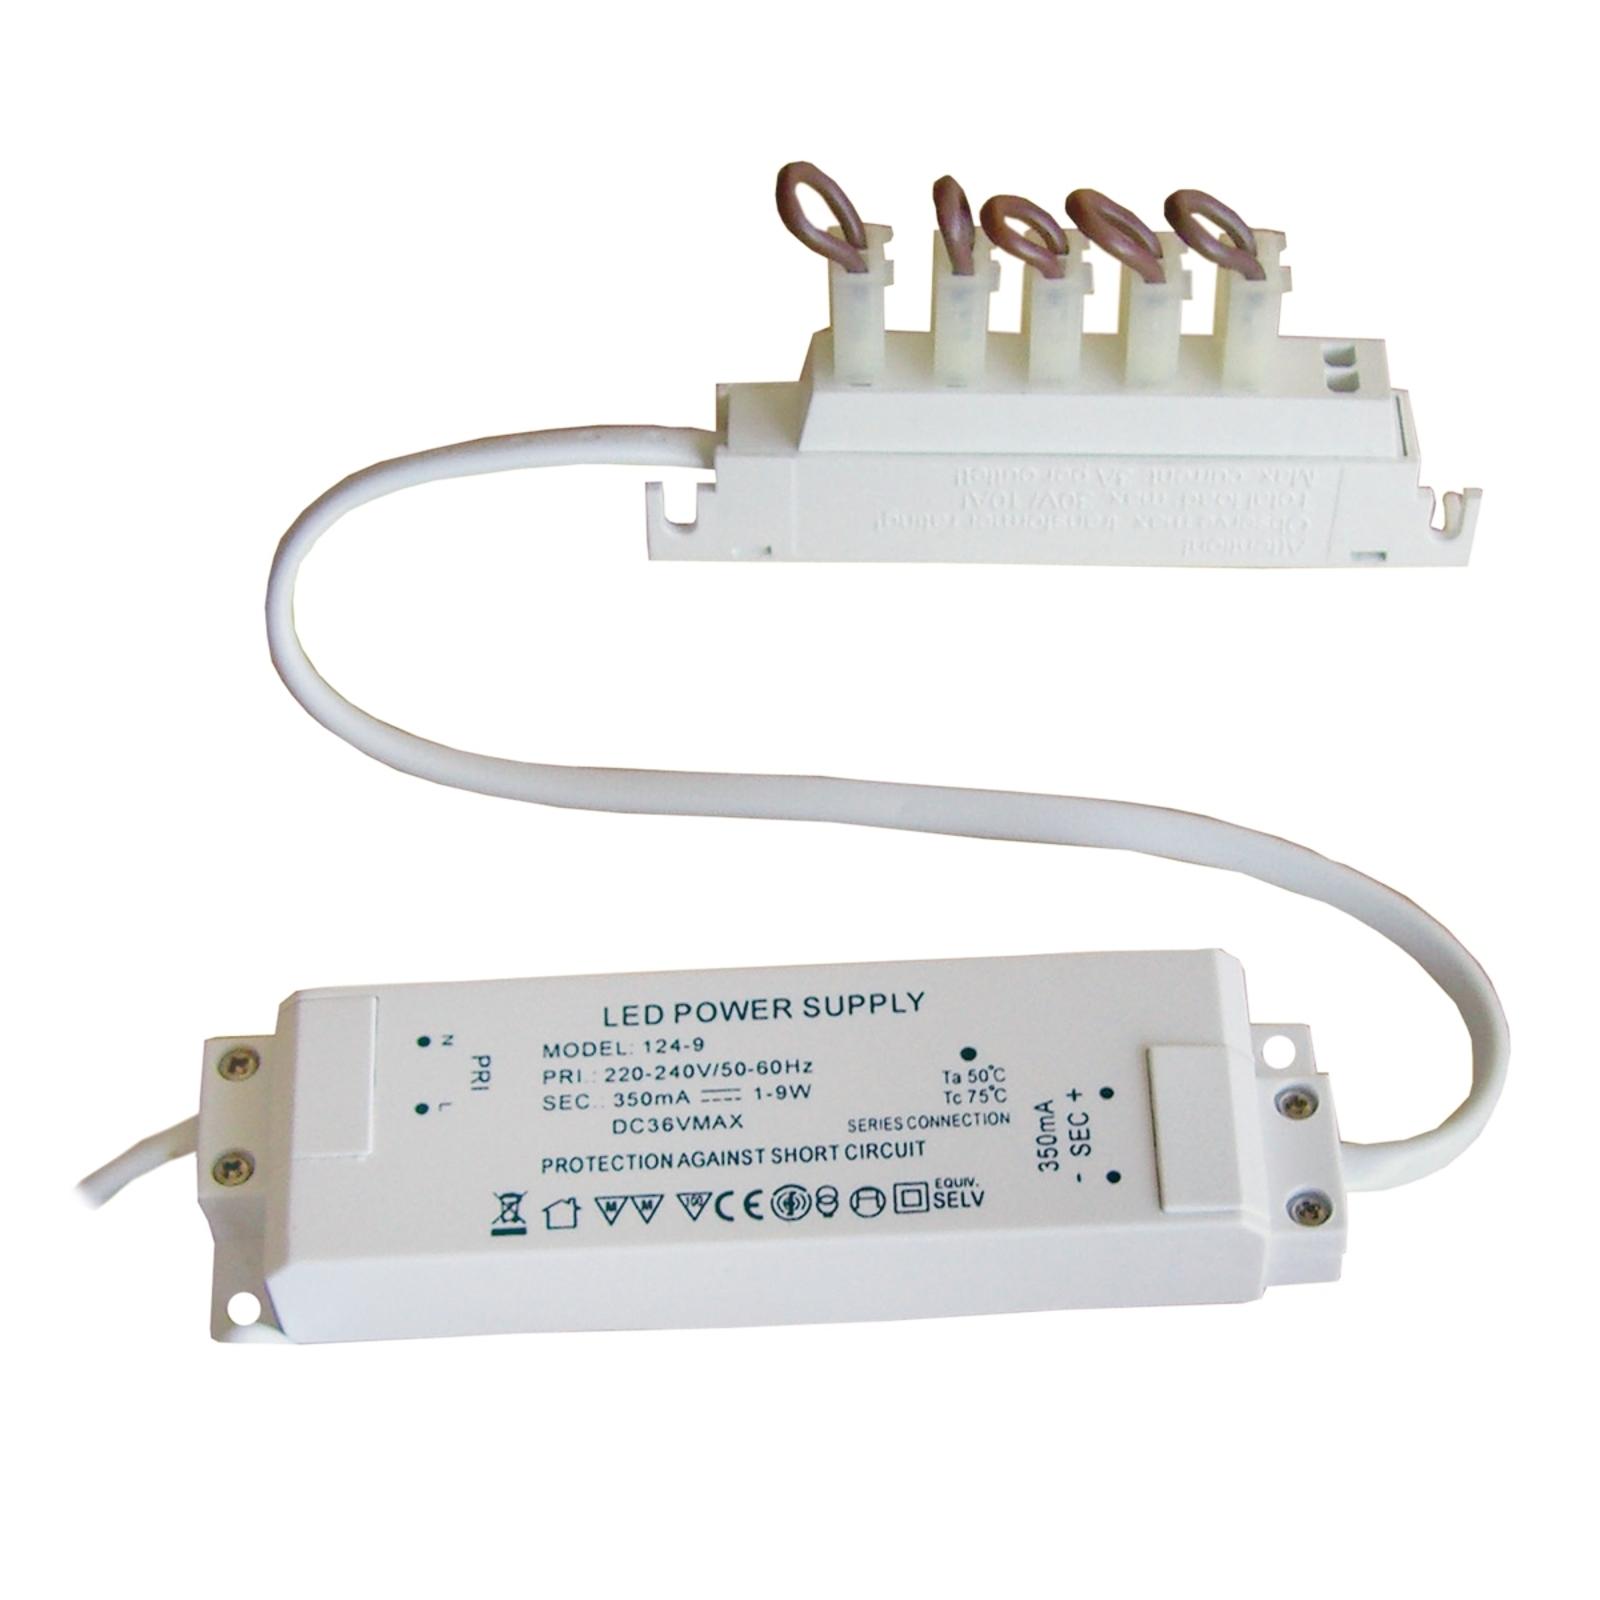 Power led-transformator